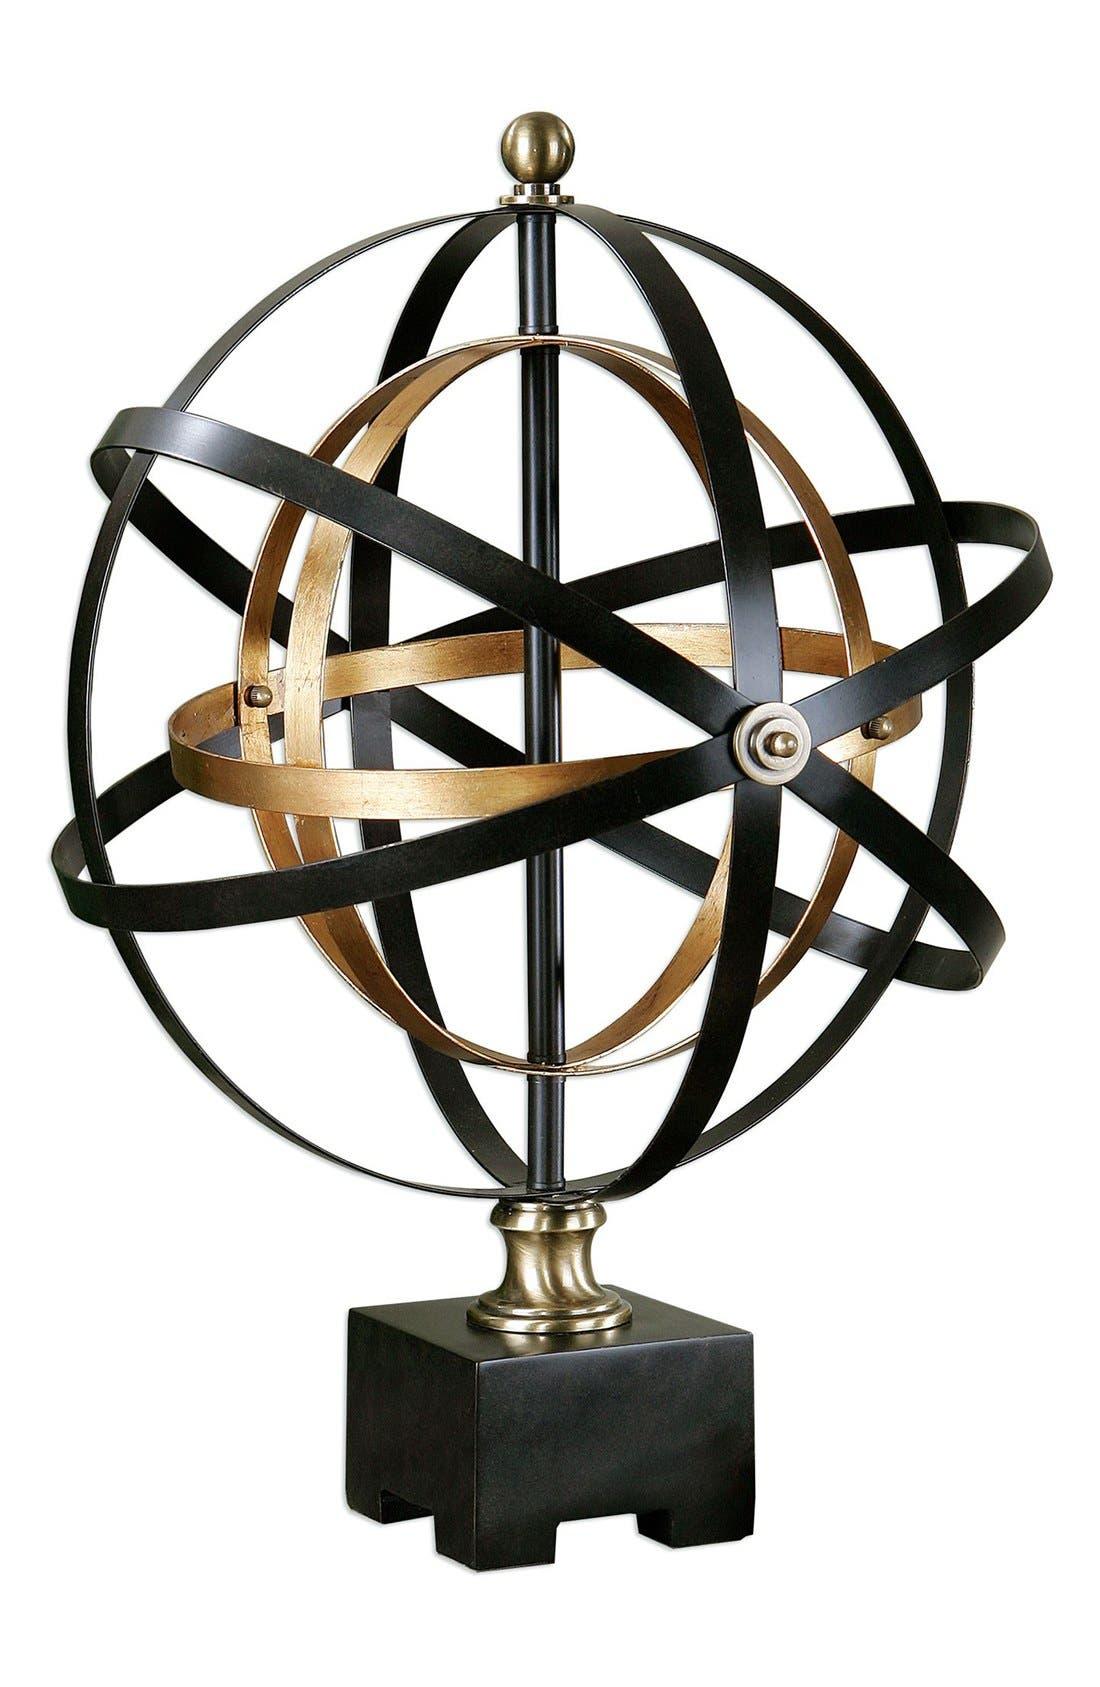 Alternate Image 1 Selected - Uttermost Orb Sculpture